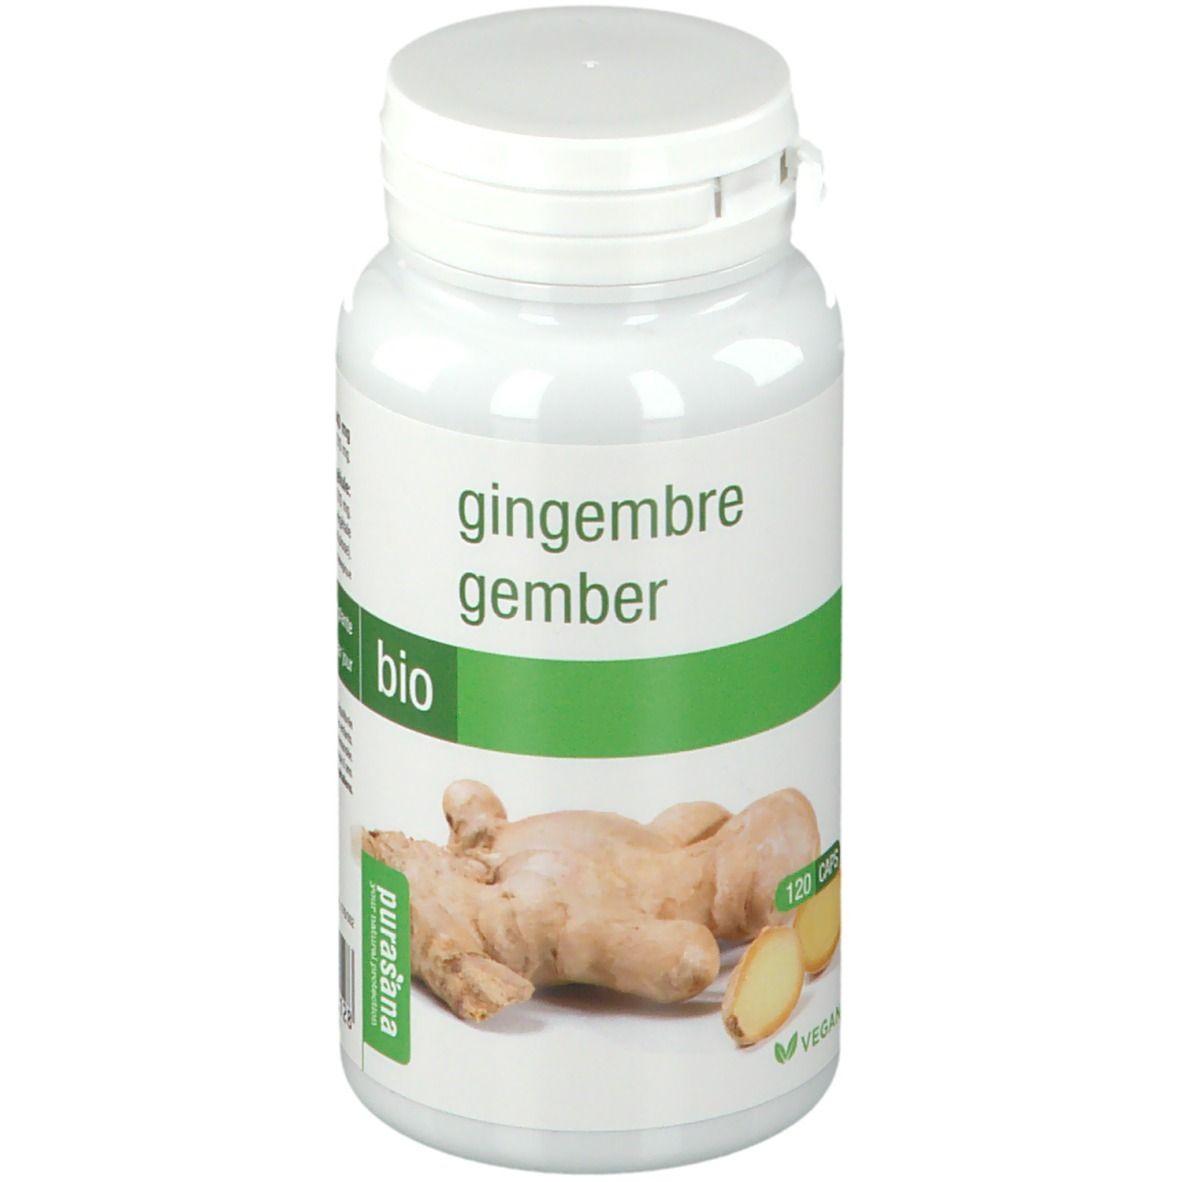 Purasana® Purasana Gingembre Bio pc(s) capsule(s)